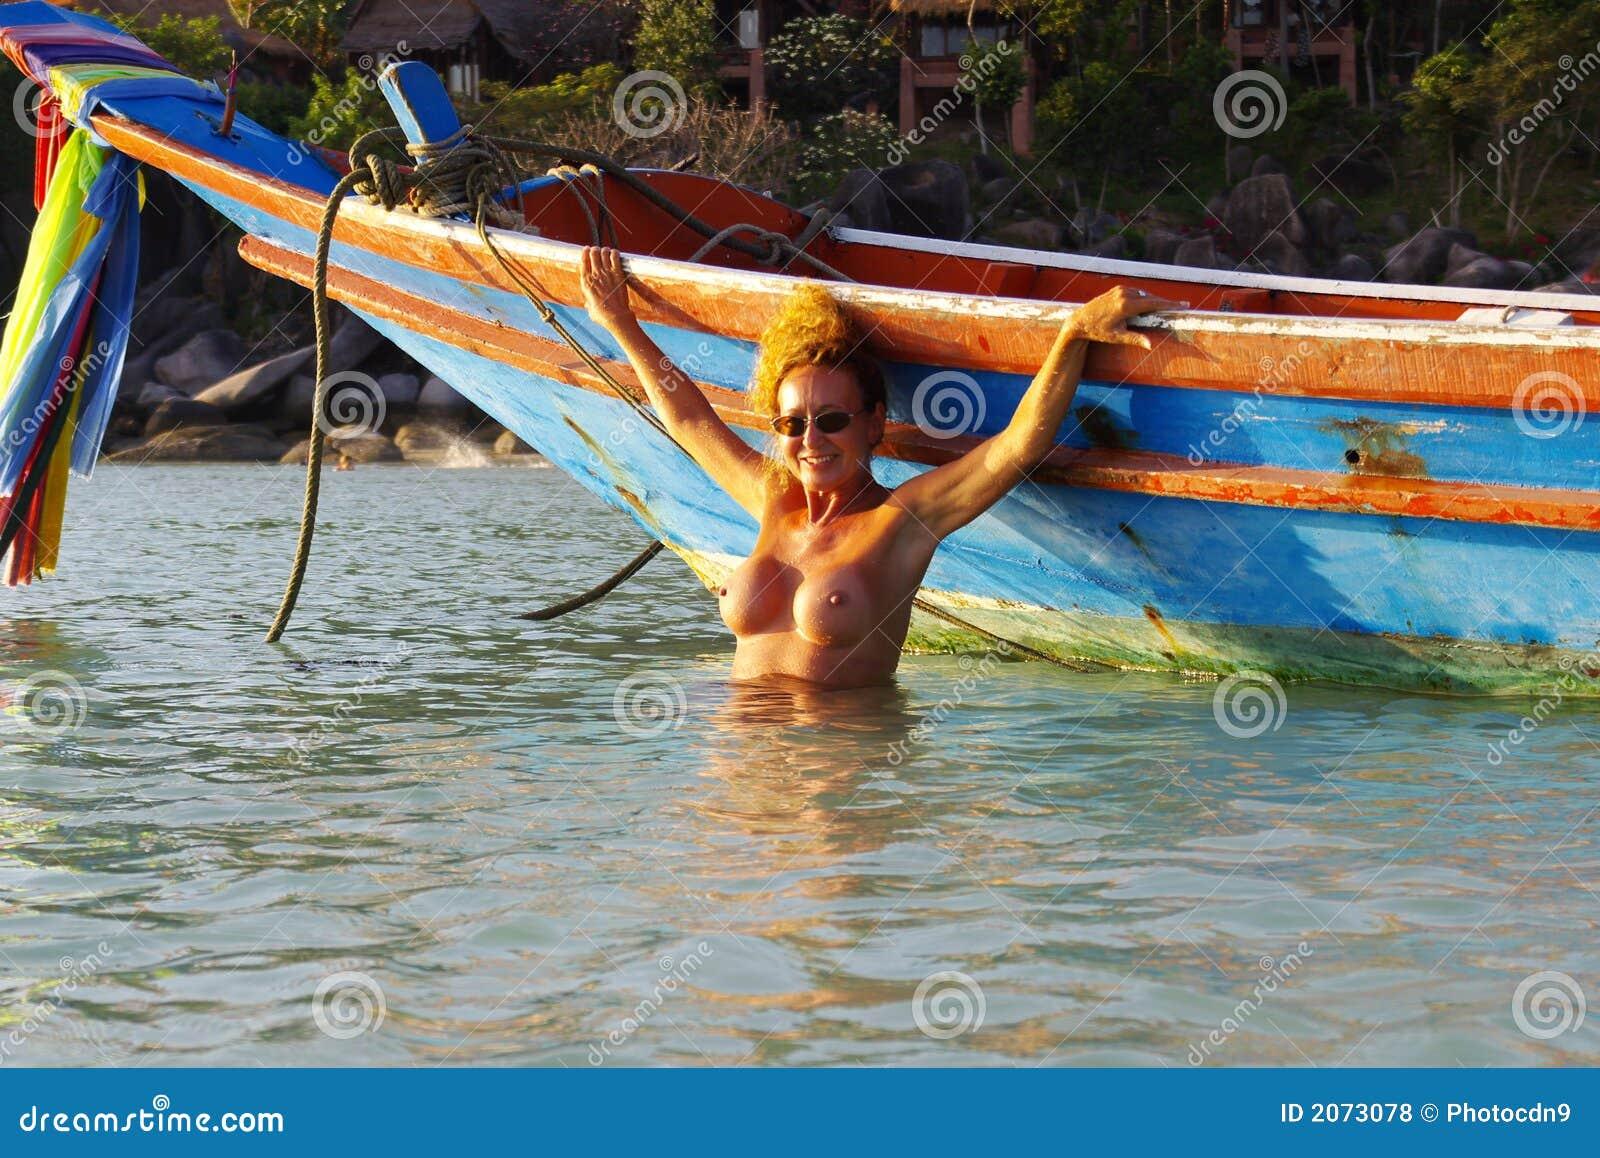 image Nude beach nude fishing beautiful blond big clit play